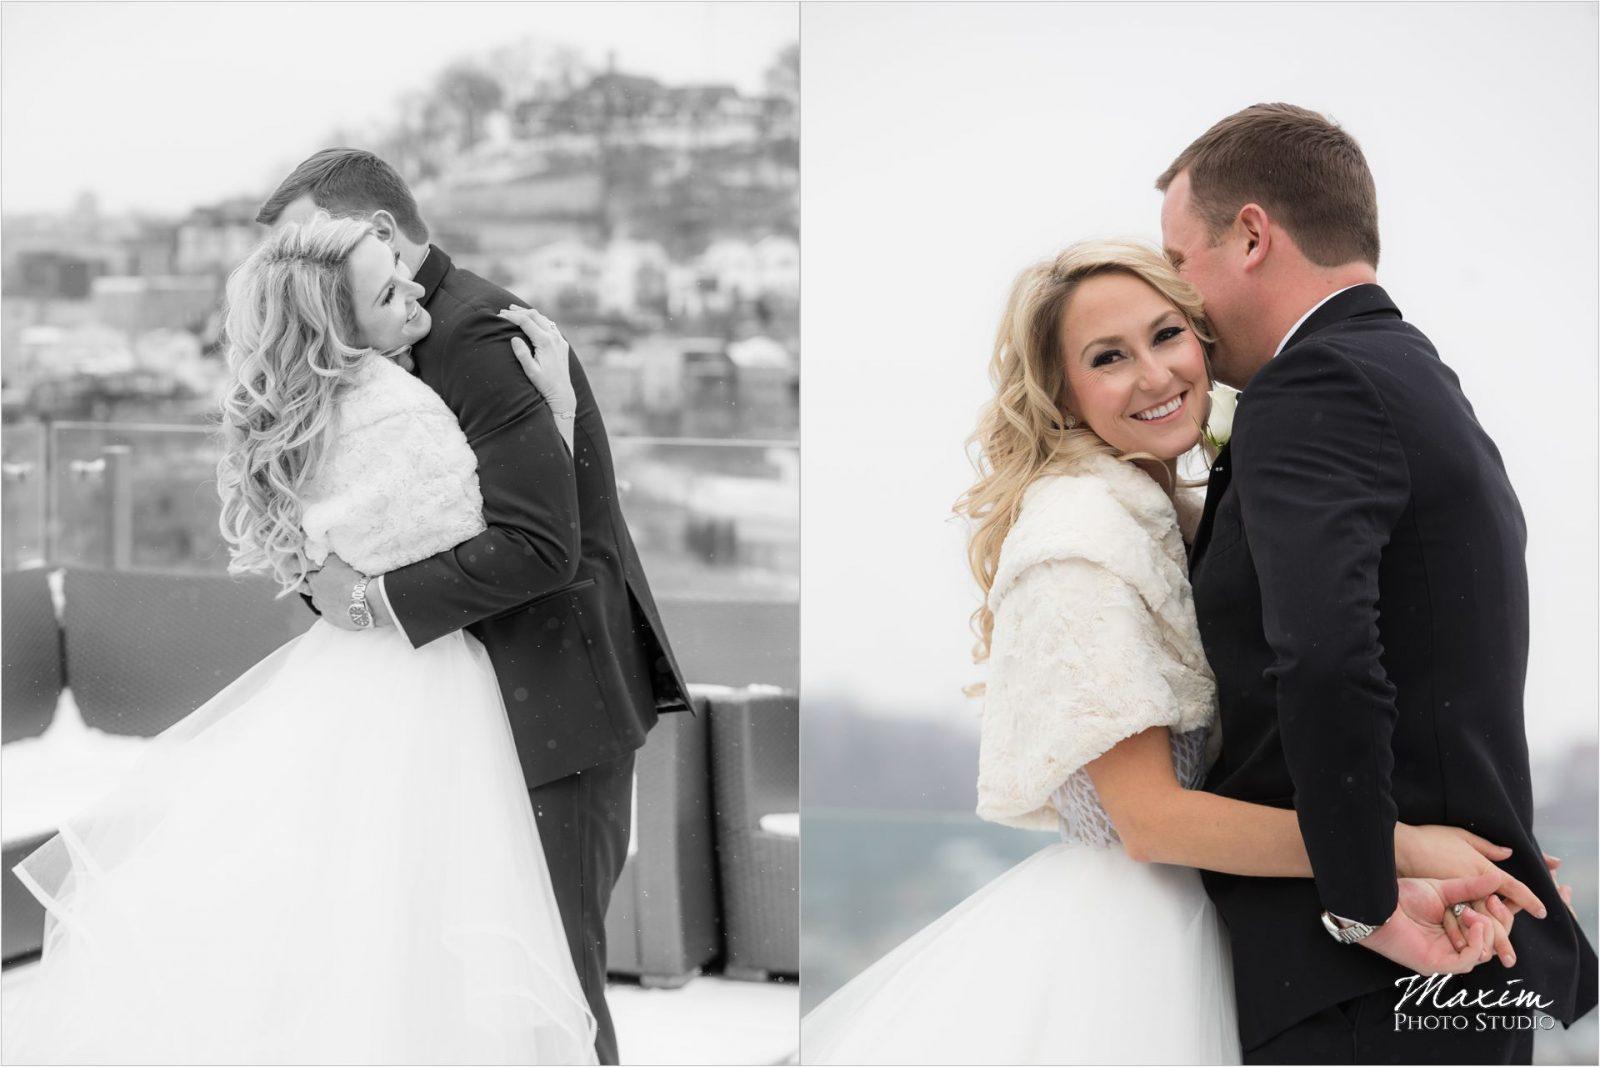 CinciCincinnati Wedding Photography winter Bride Groomnnati Wedding Photography winter Bridal Party